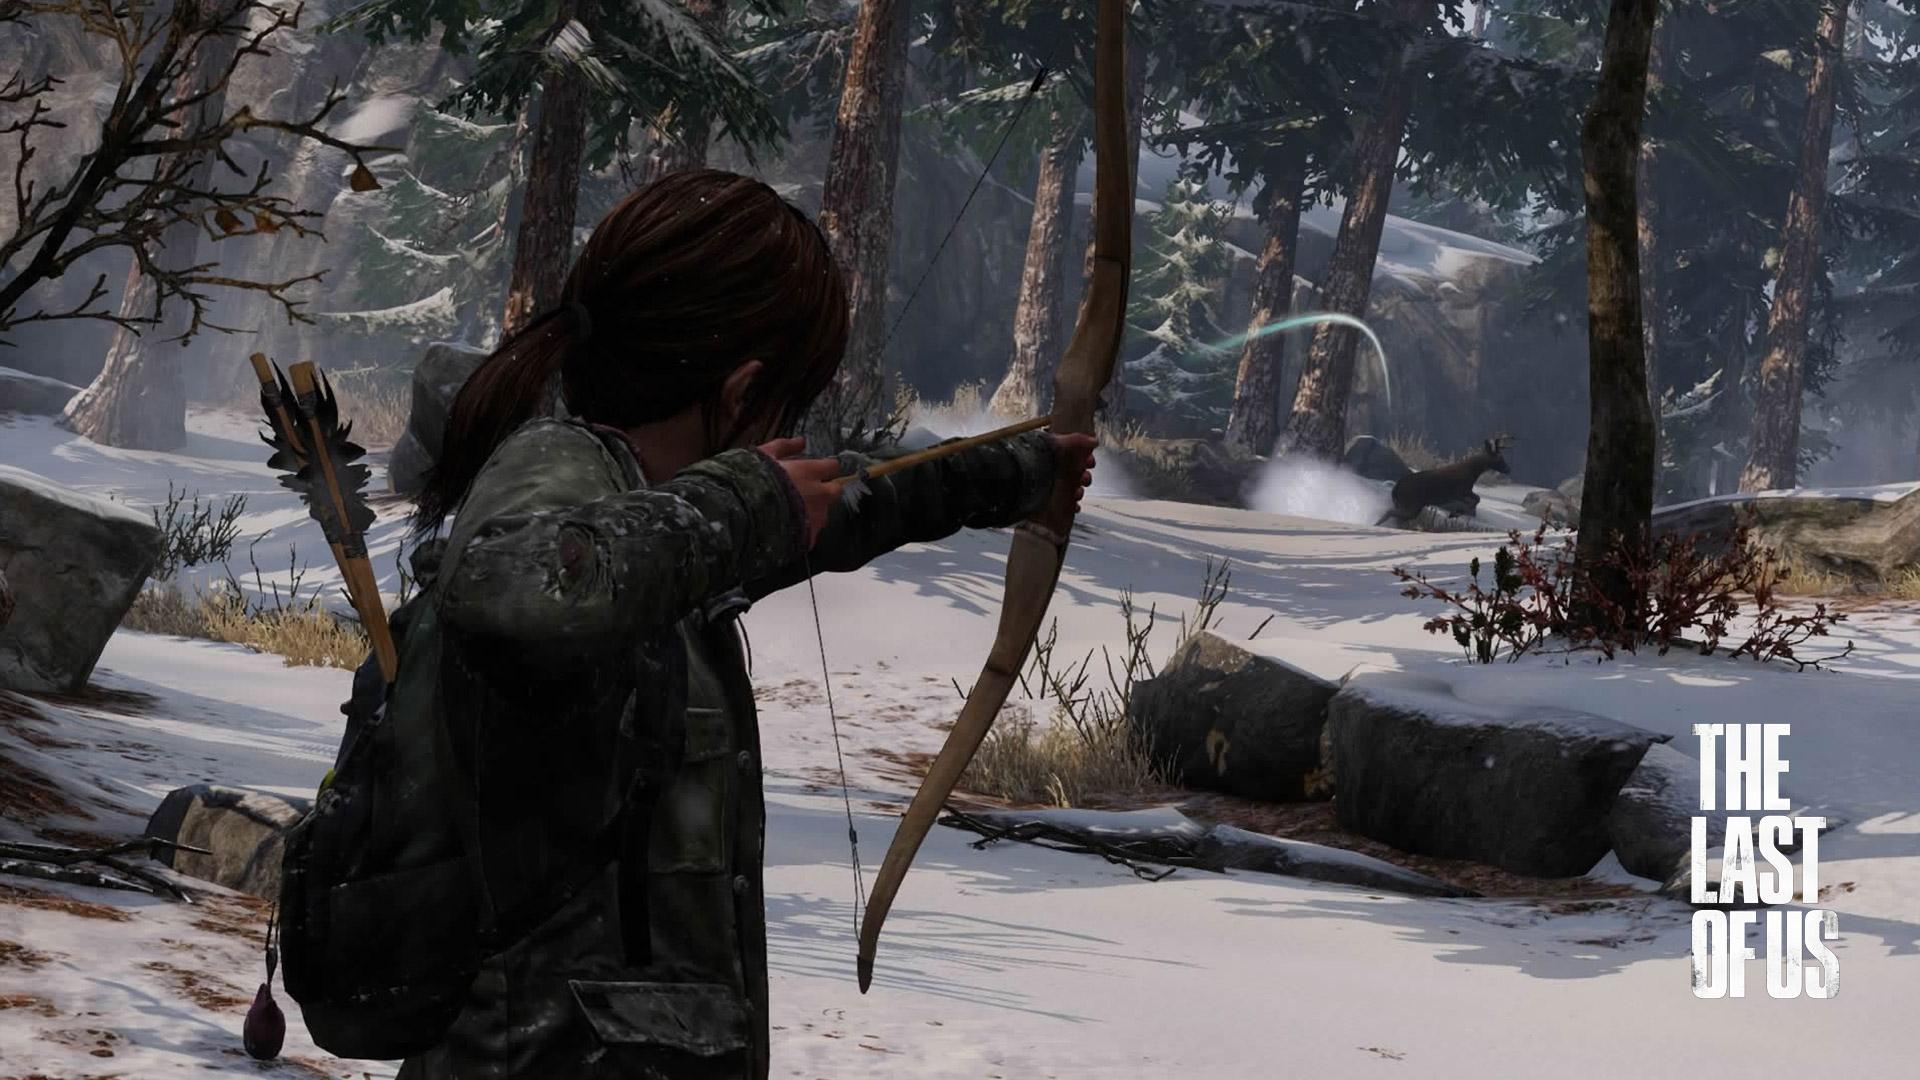 The Last of Us wallpaper 10